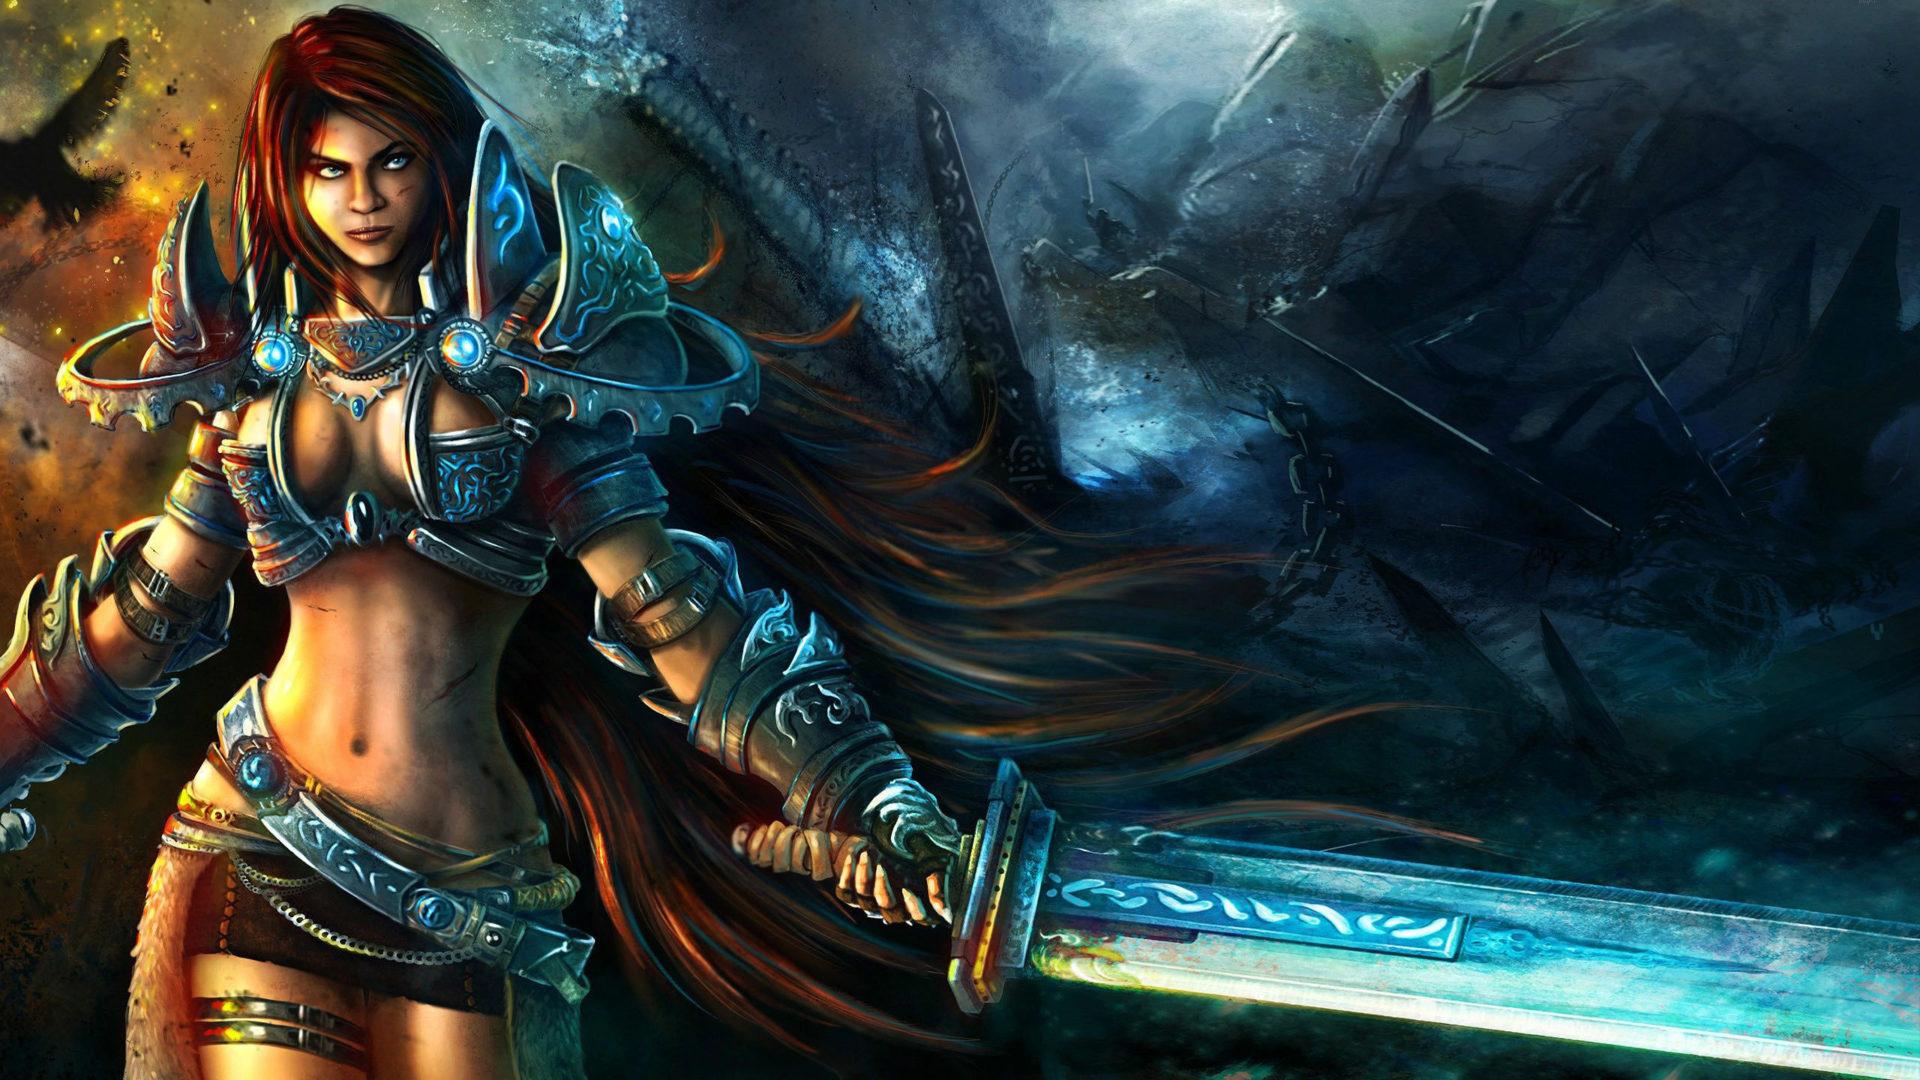 Gothic Girl Wallpaper Iphone Woman Warrior Fantasy Hd Wallpaper 2560x1440 26482